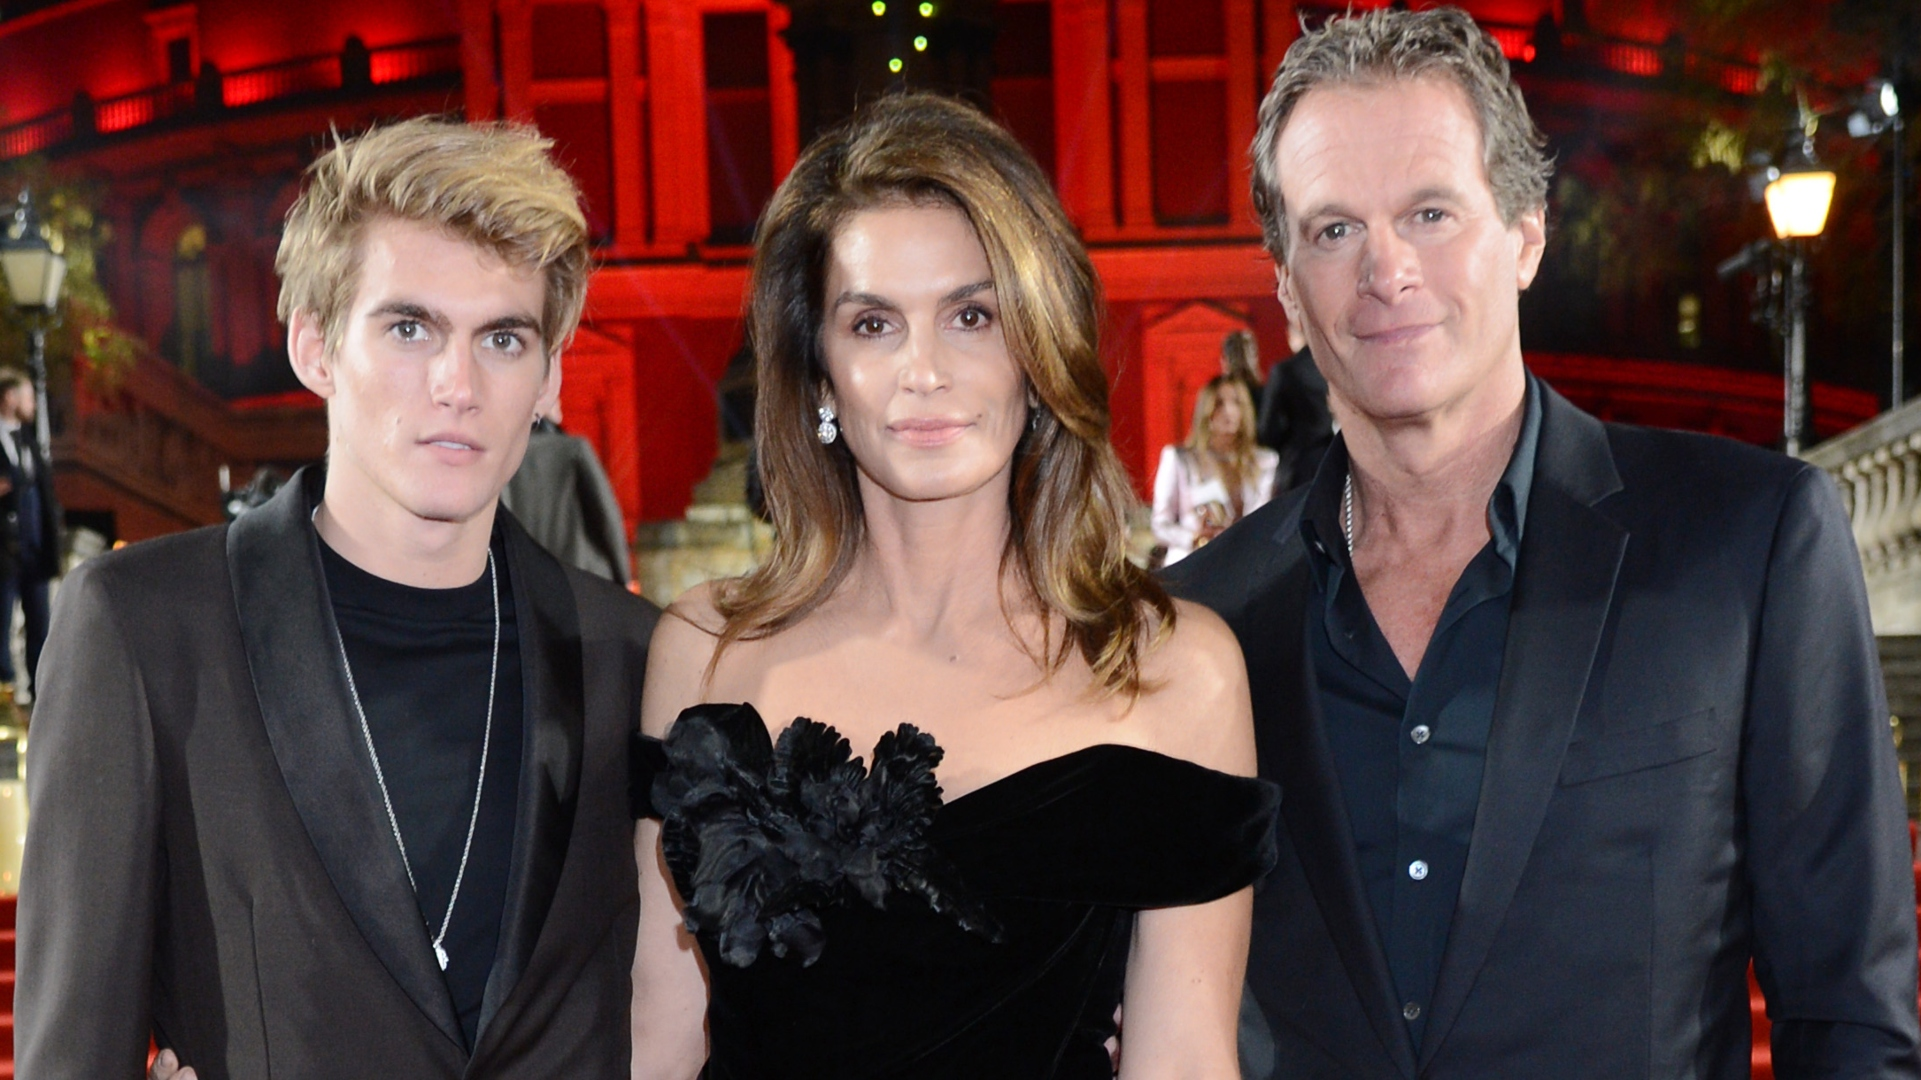 Cindy Crawford & Rande Gerber's Son Presley Has Them 'Concerned'